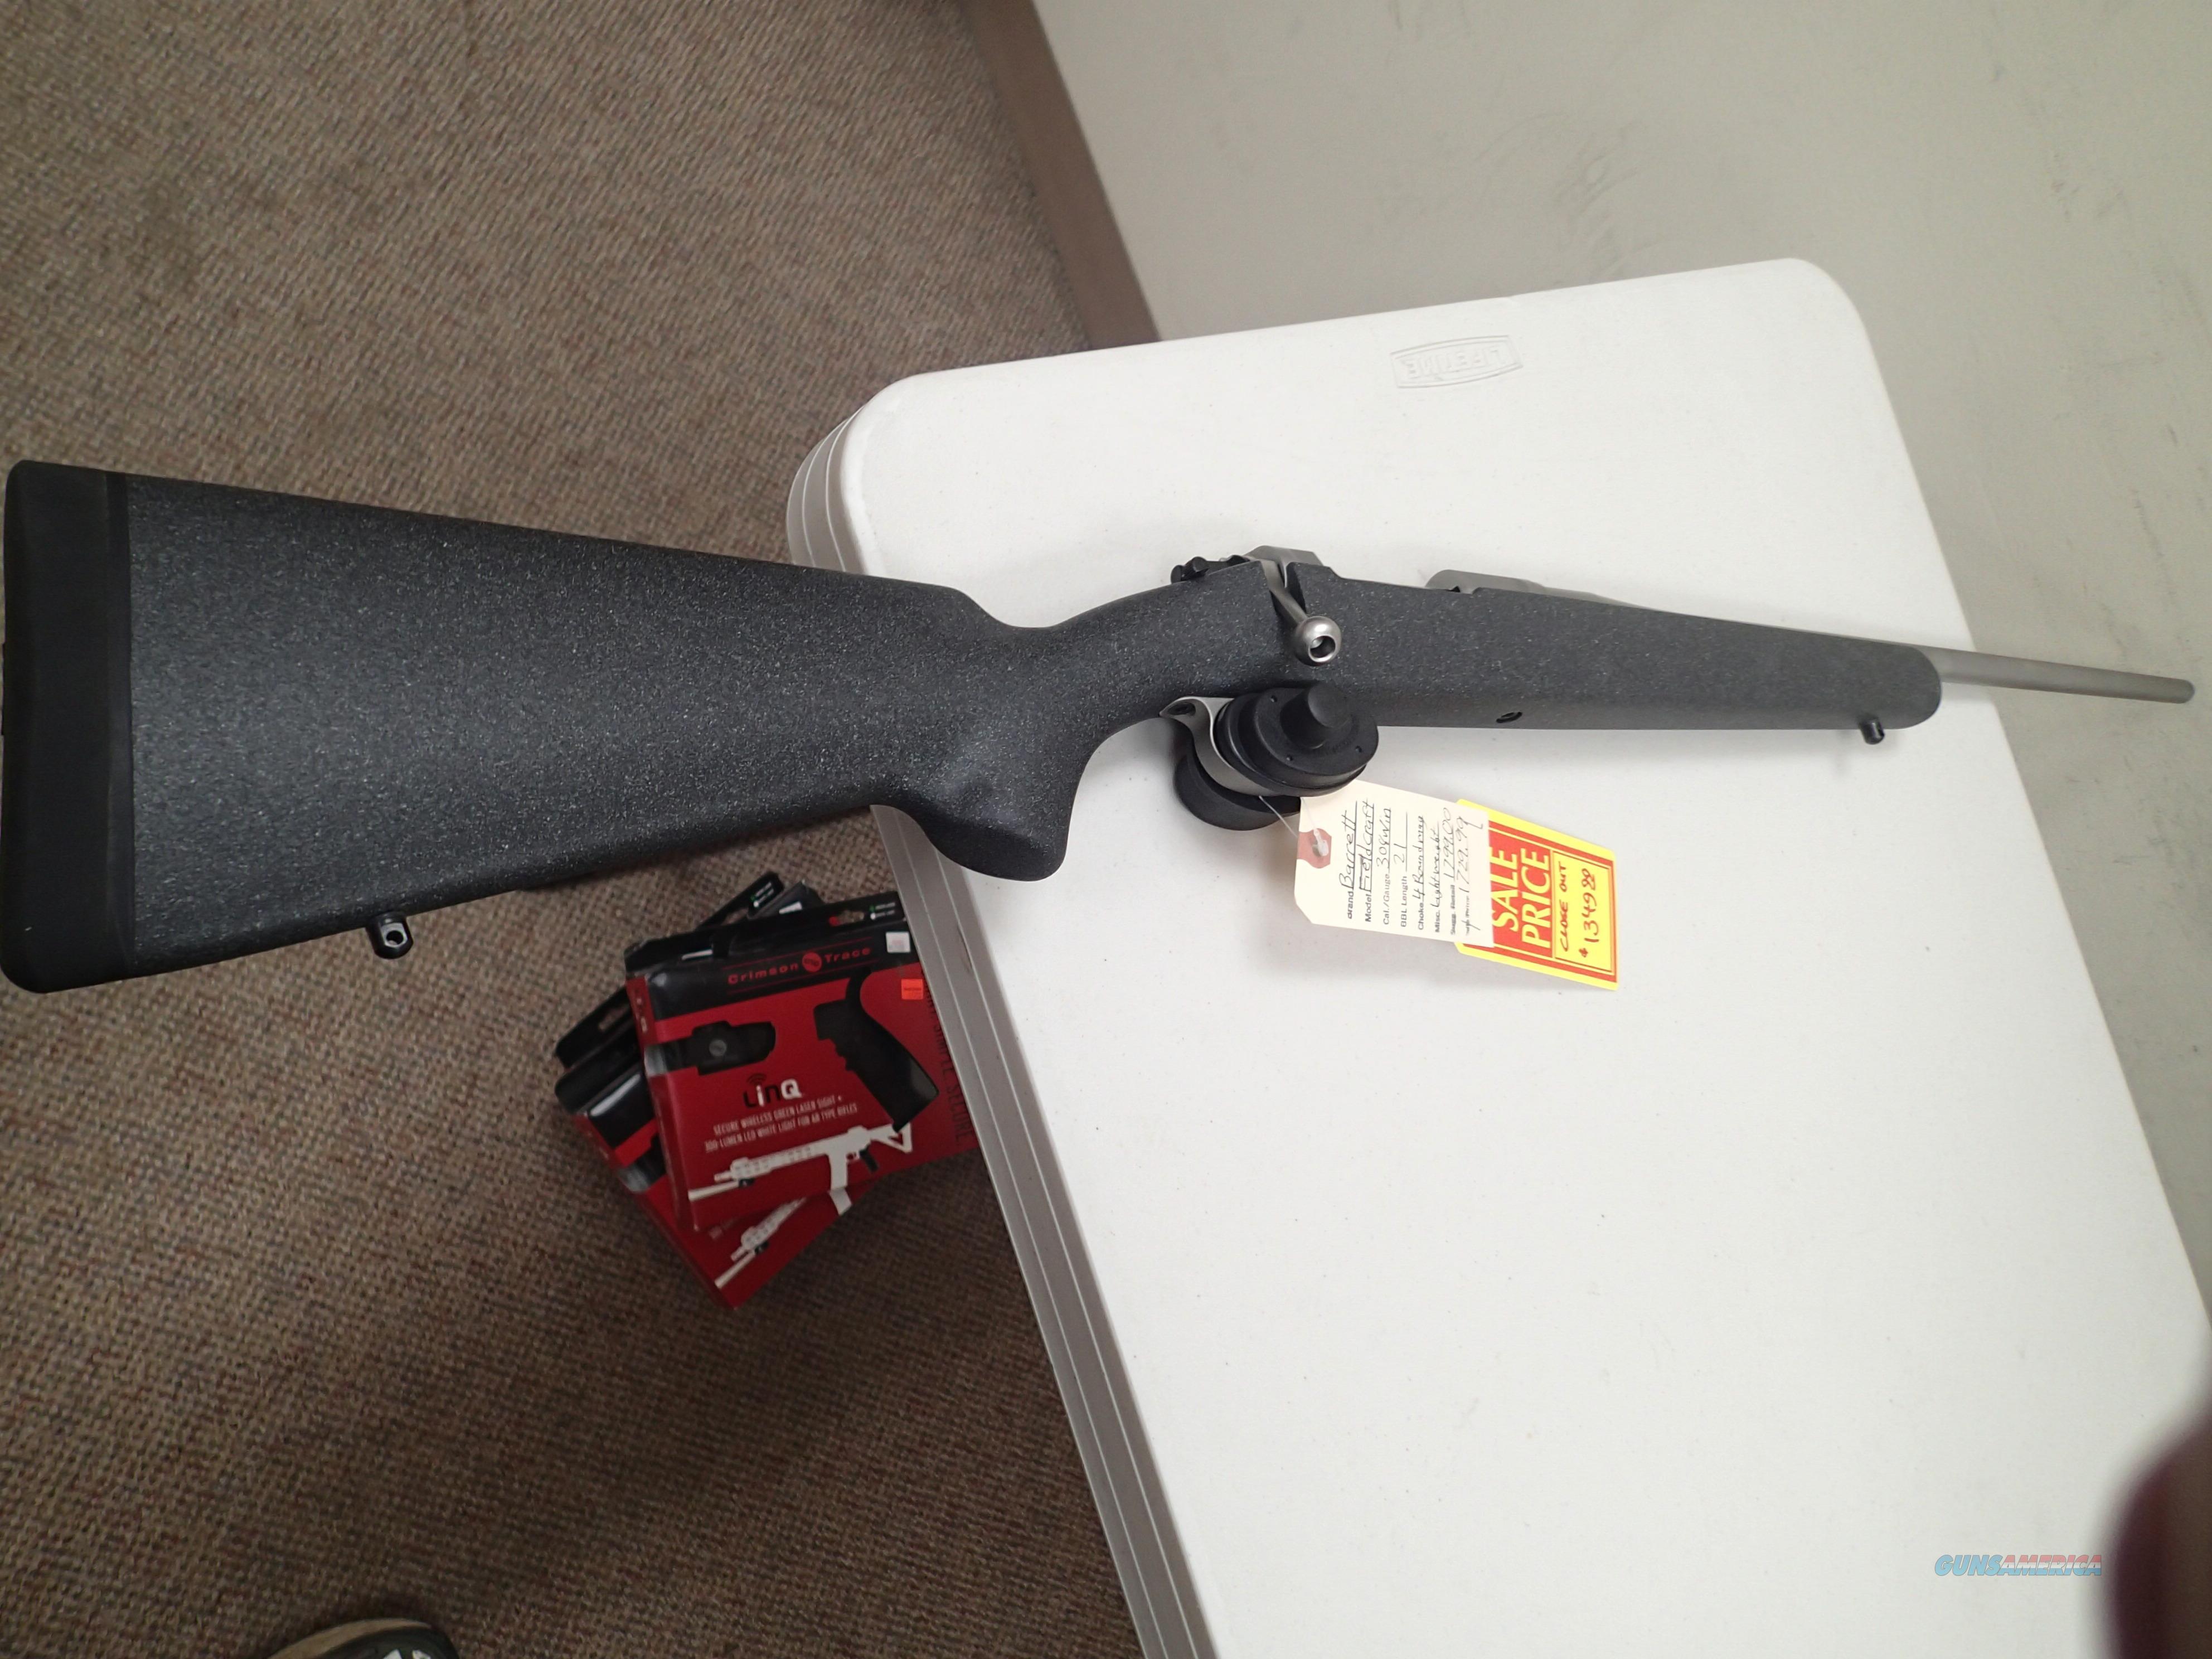 "BARRETT FIELDCRAFT 21"" BARREL 308 WIN CLOSEOUT PRICES  Guns > Rifles > Barrett Rifles"